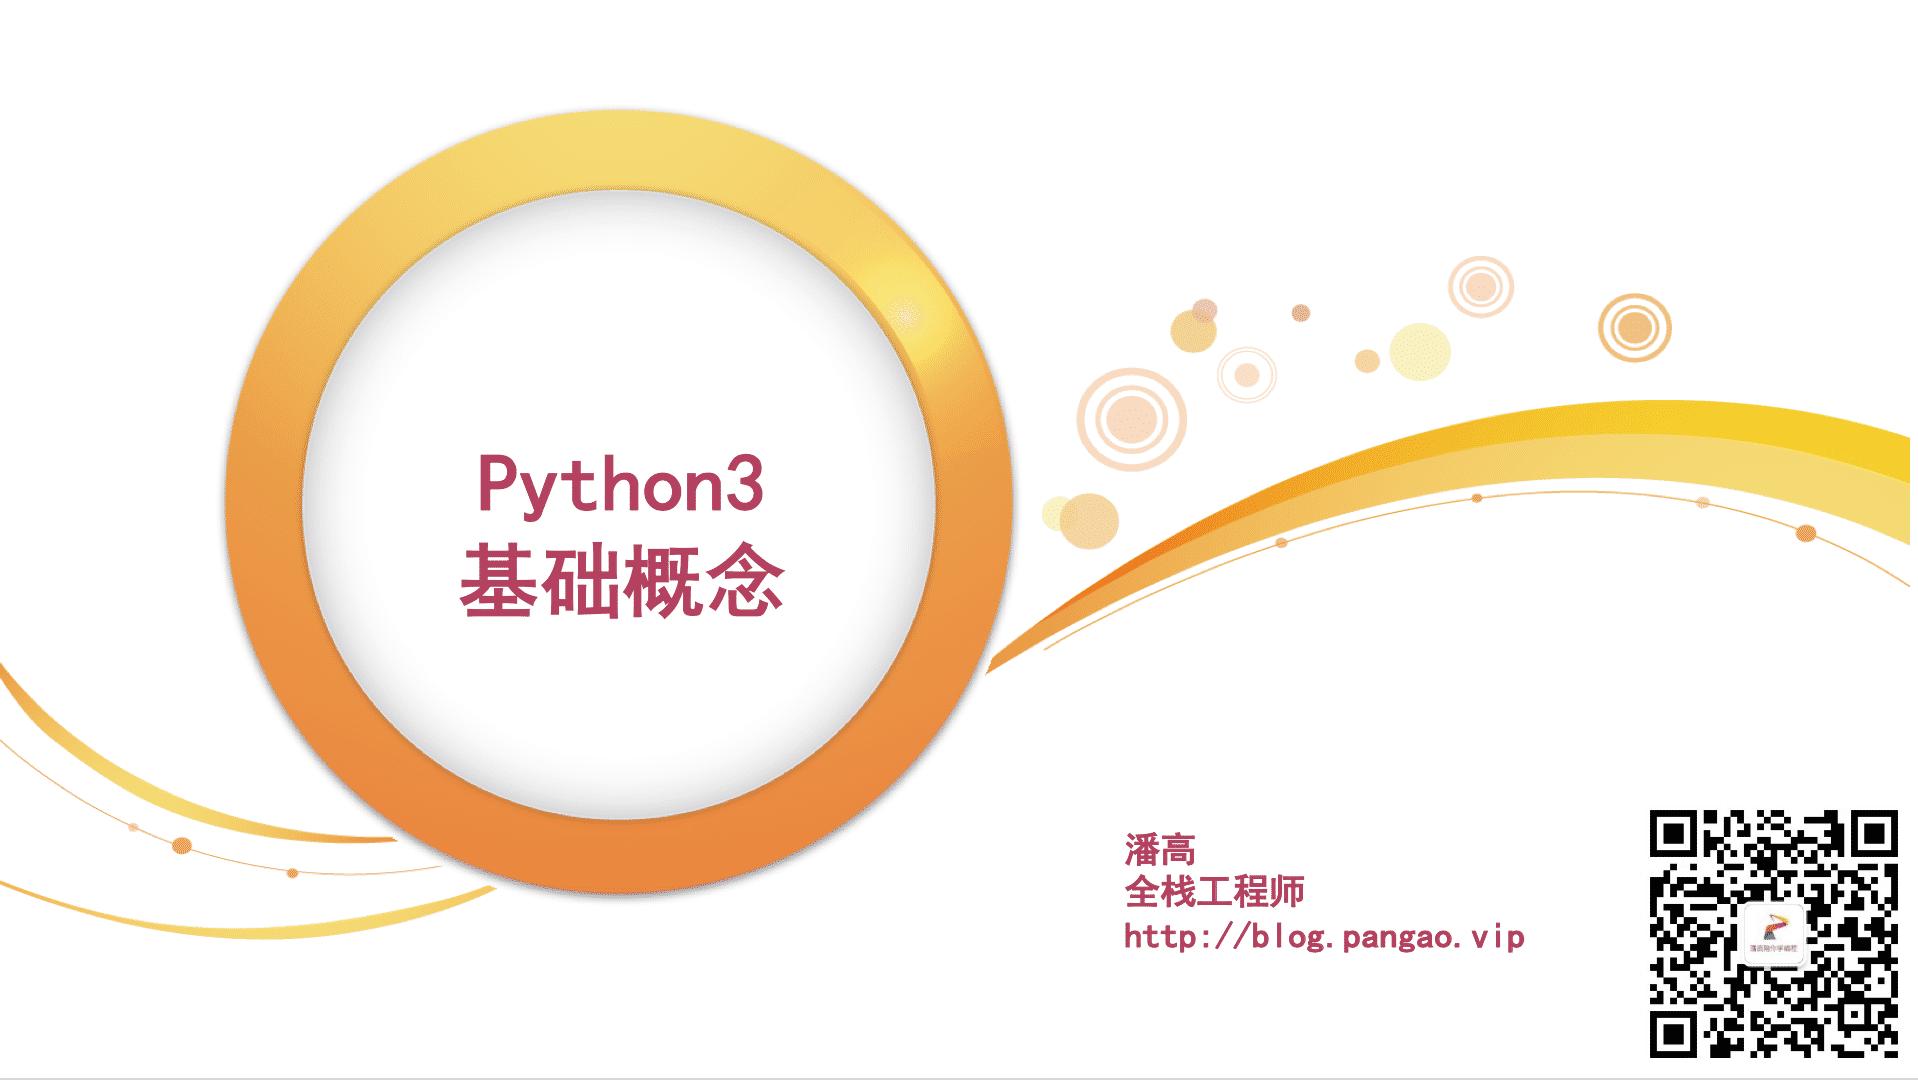 Python3基础概念-Python入门到精通